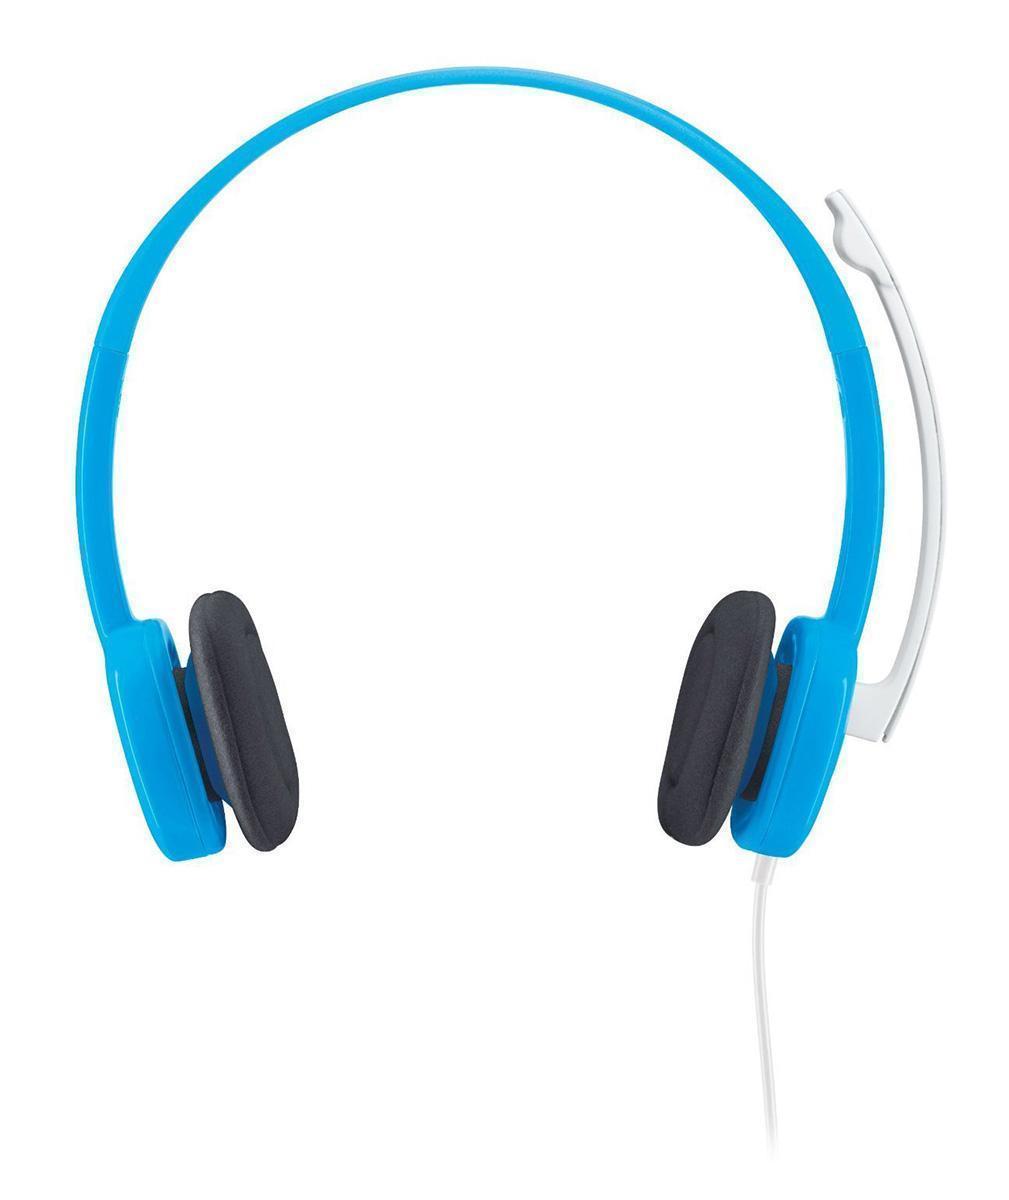 Logitech Stereo Headset H150, Blueberry (981-000368)